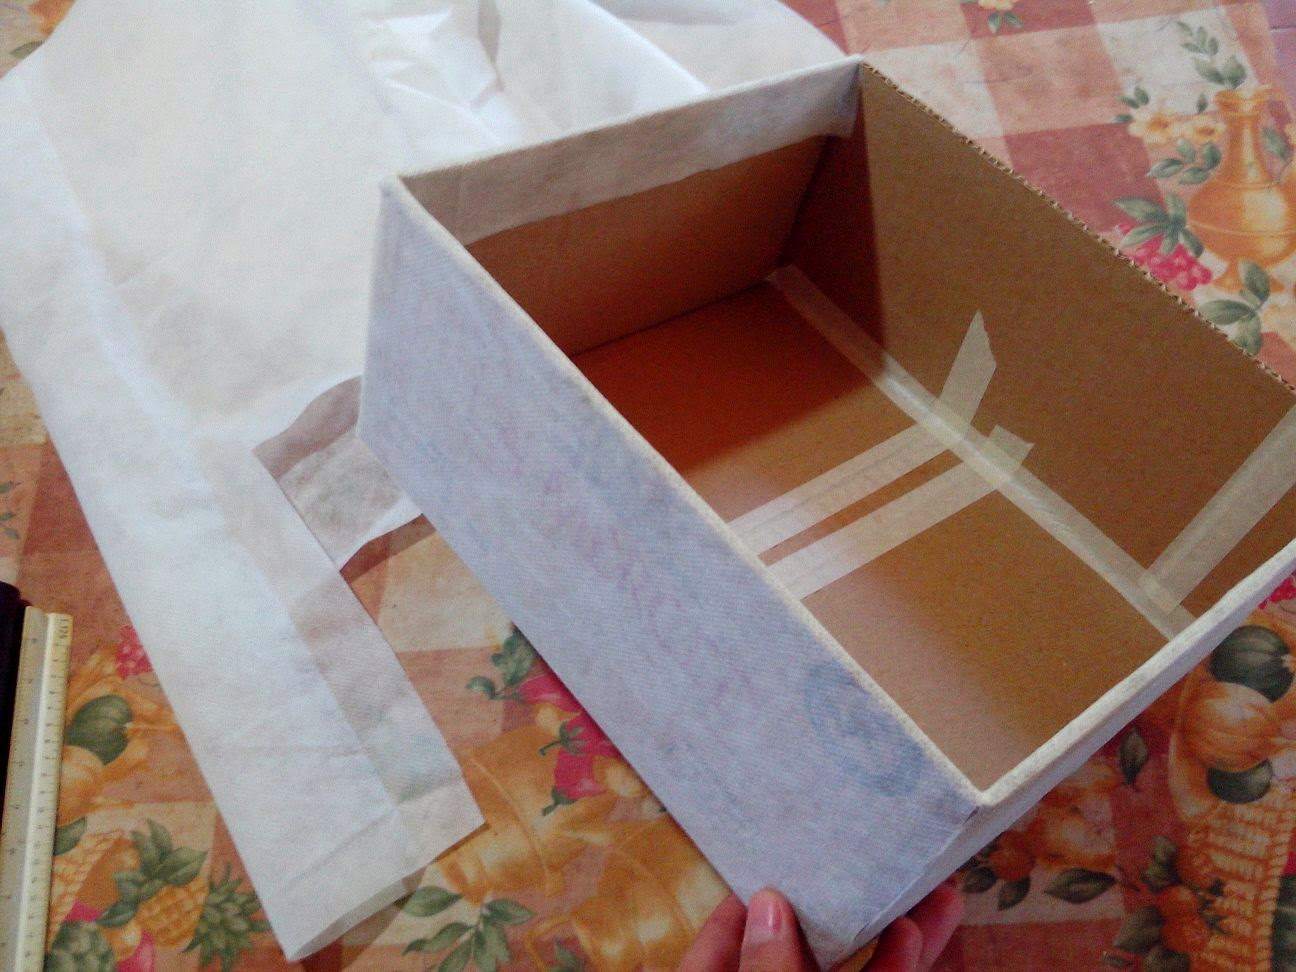 Manualidades caja forrada con tela para guardar objetos - Cajas forradas de papel ...